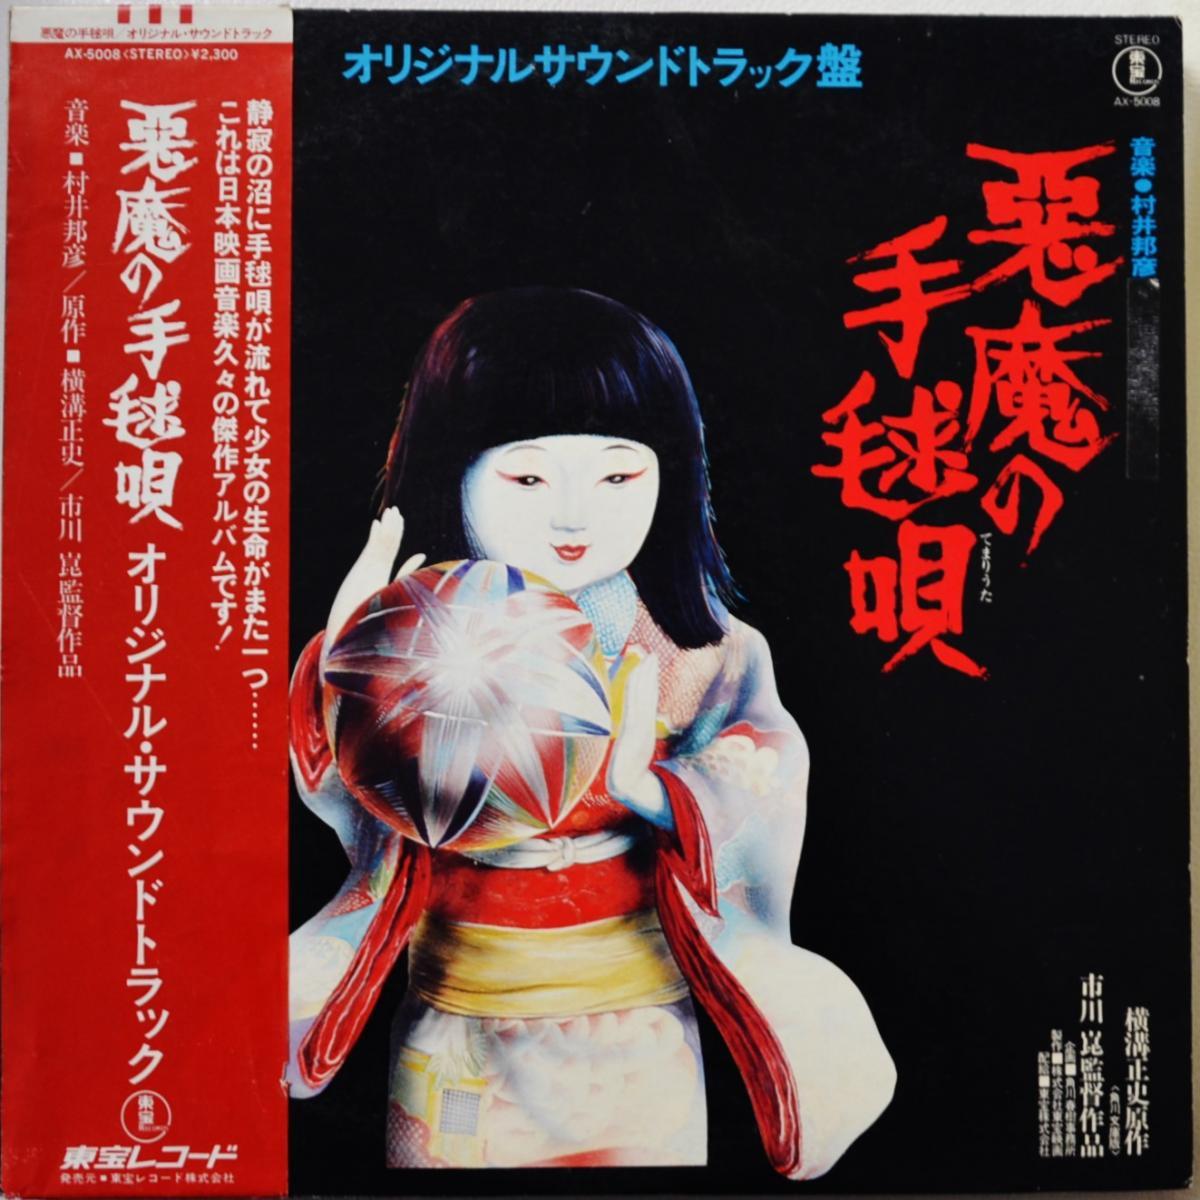 O.S.T.(村井邦彦 KUNIHIKO MURAI) / 悪魔の手毬唄 (オリジナルサウンドトラック盤) (LP)